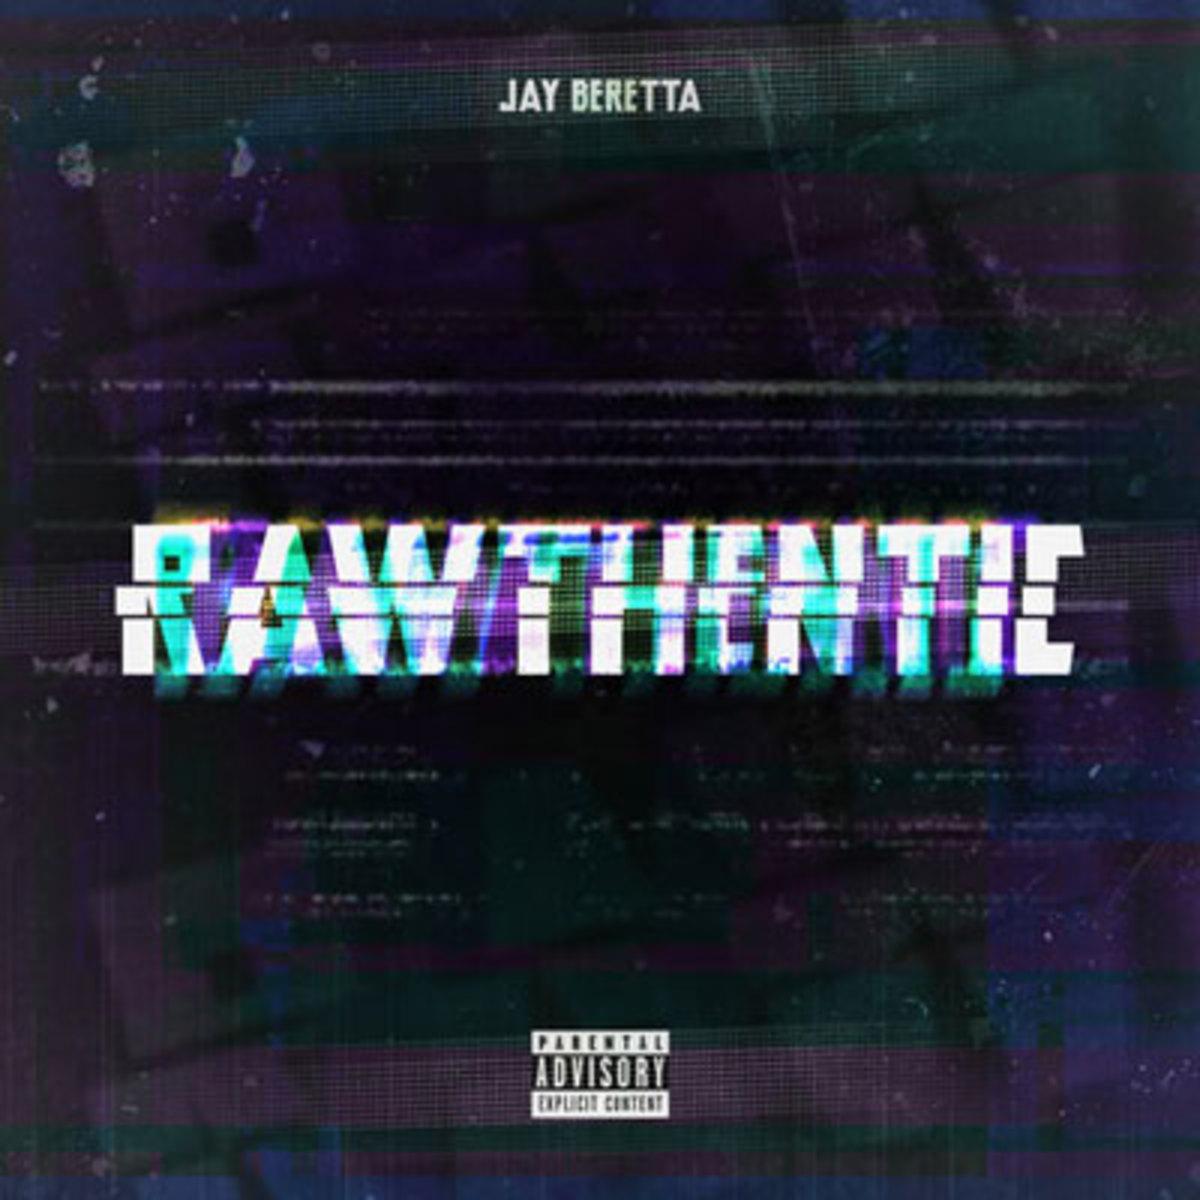 jayberetta-rawthentic.jpg